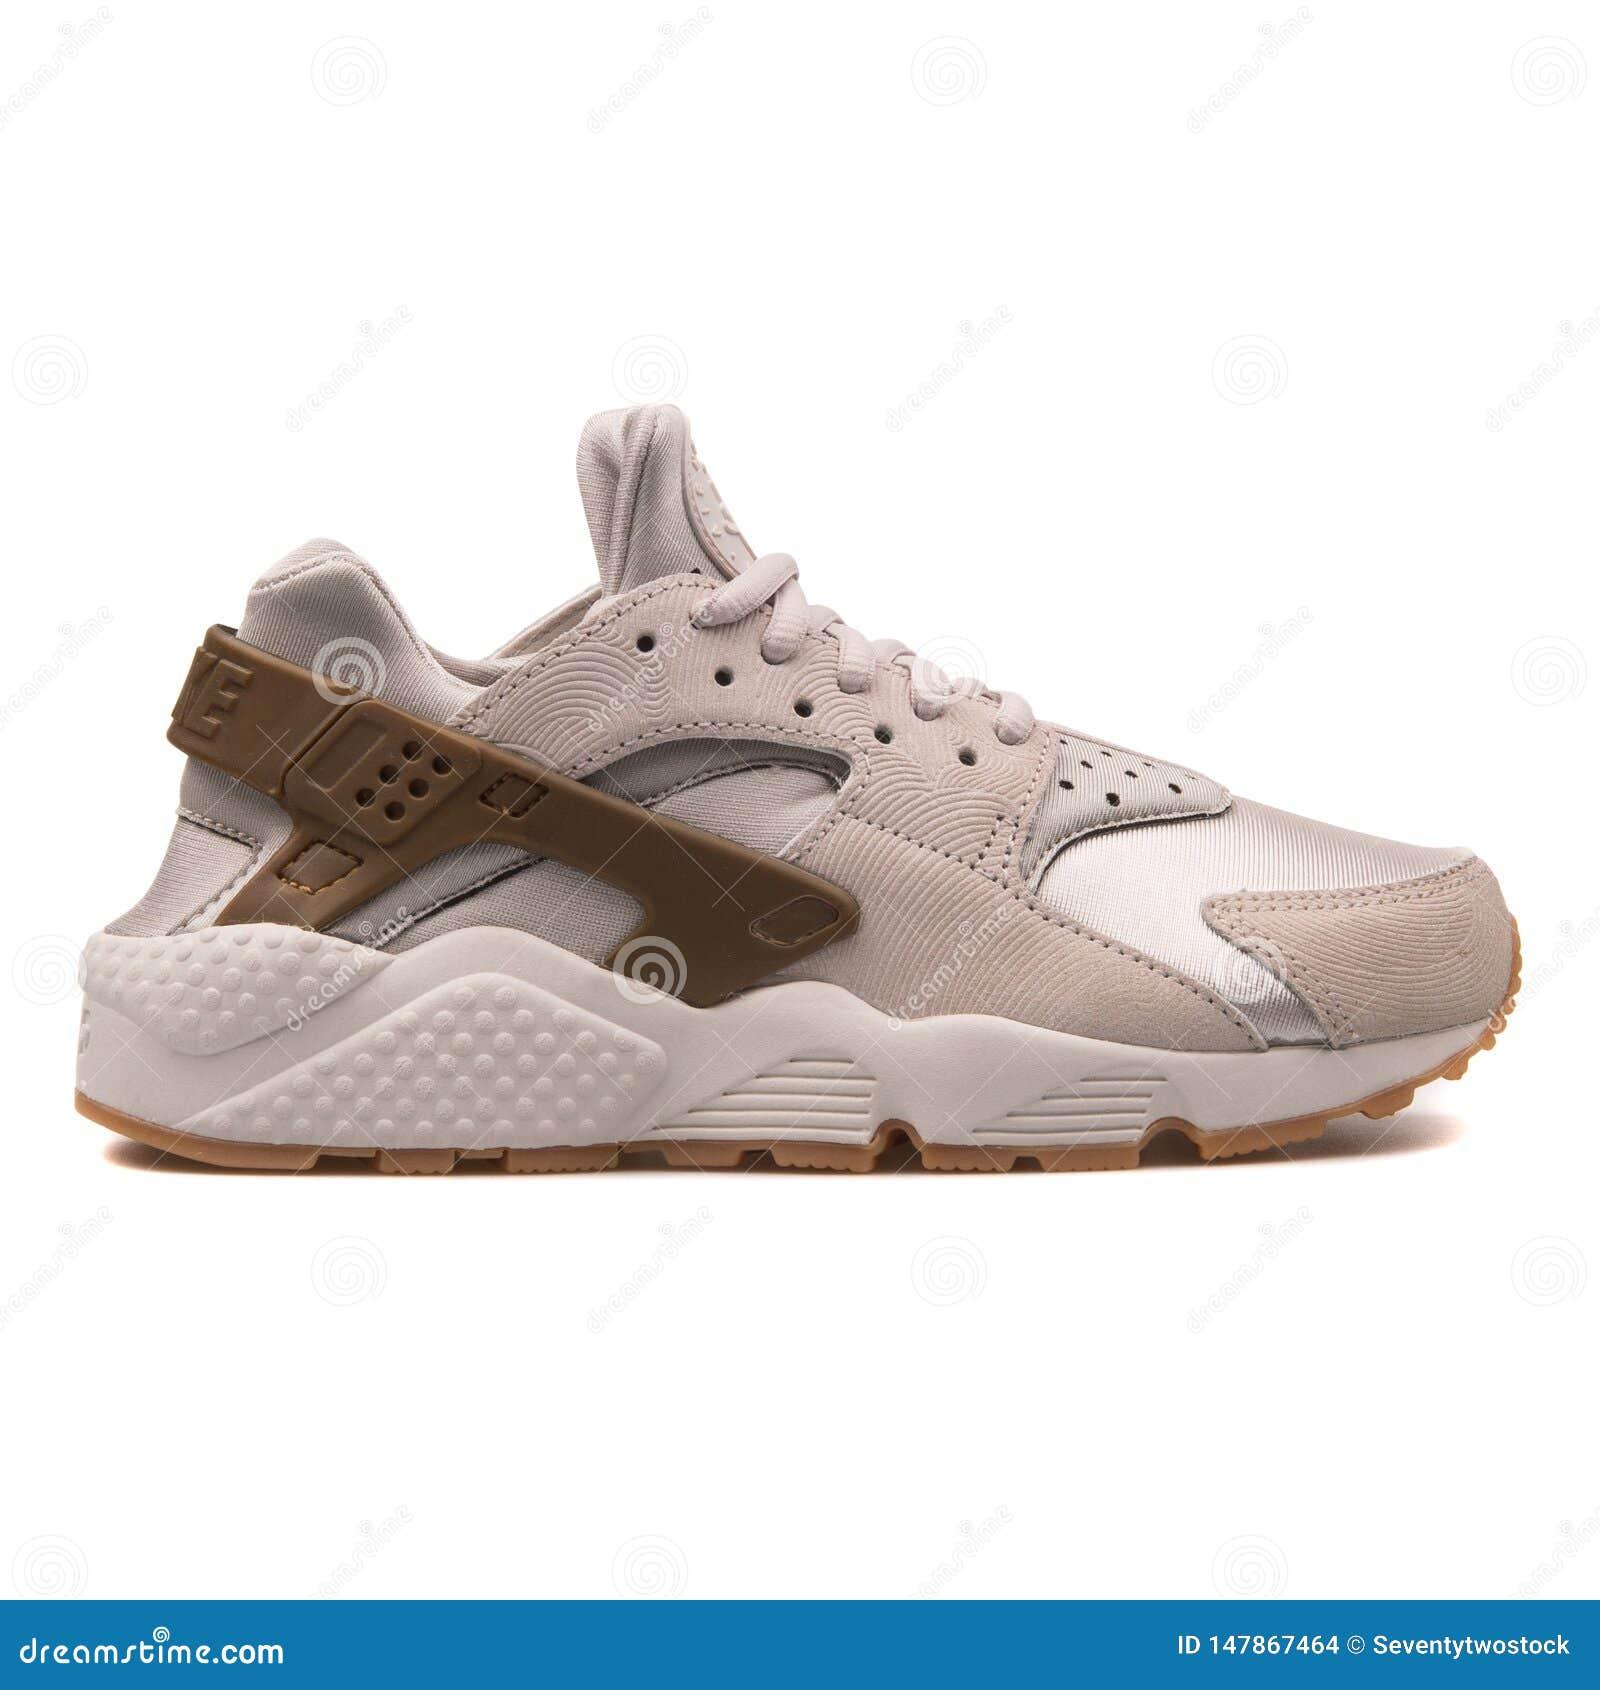 Nike Air Huarache Run Premium Suede Grey Sneaker Editorial Stock ...